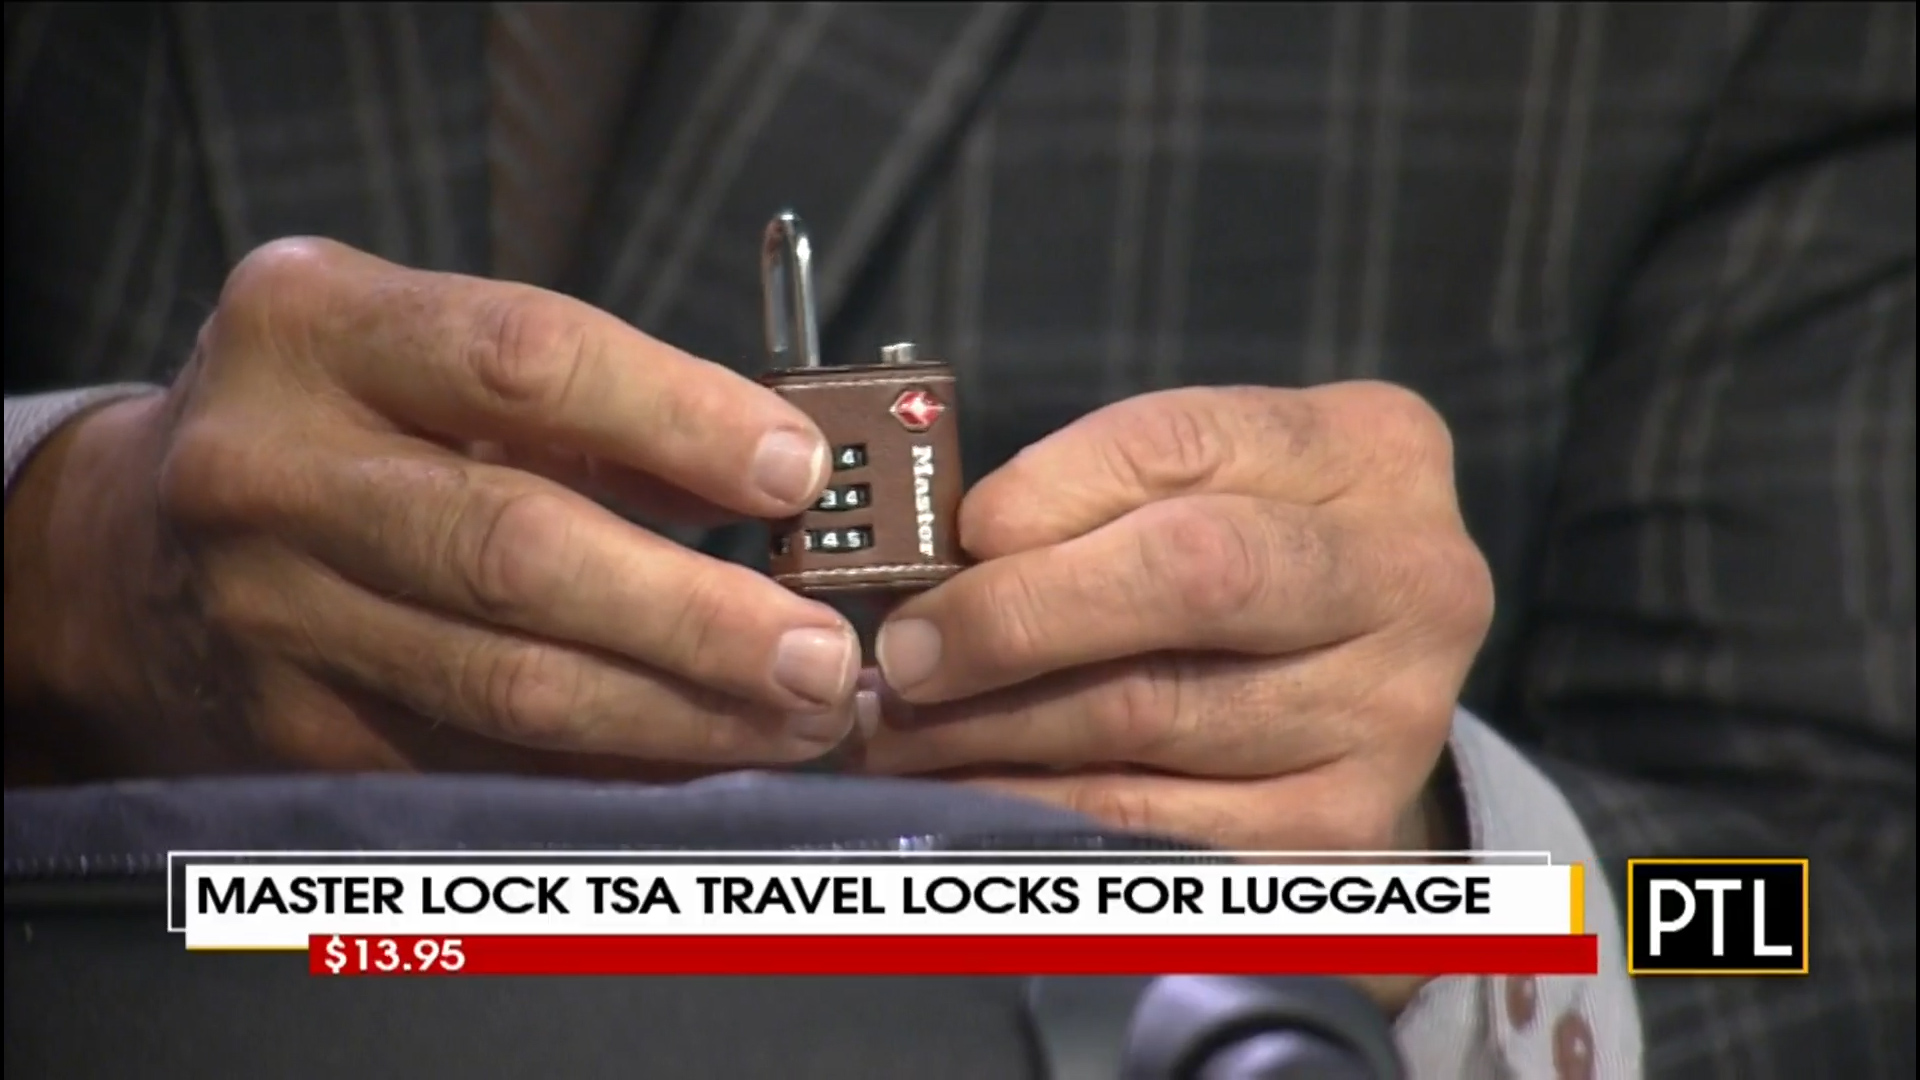 MASTER LOCK TSA TRAVEL LOCKS for LUGGAGE - $13.95Shop Now